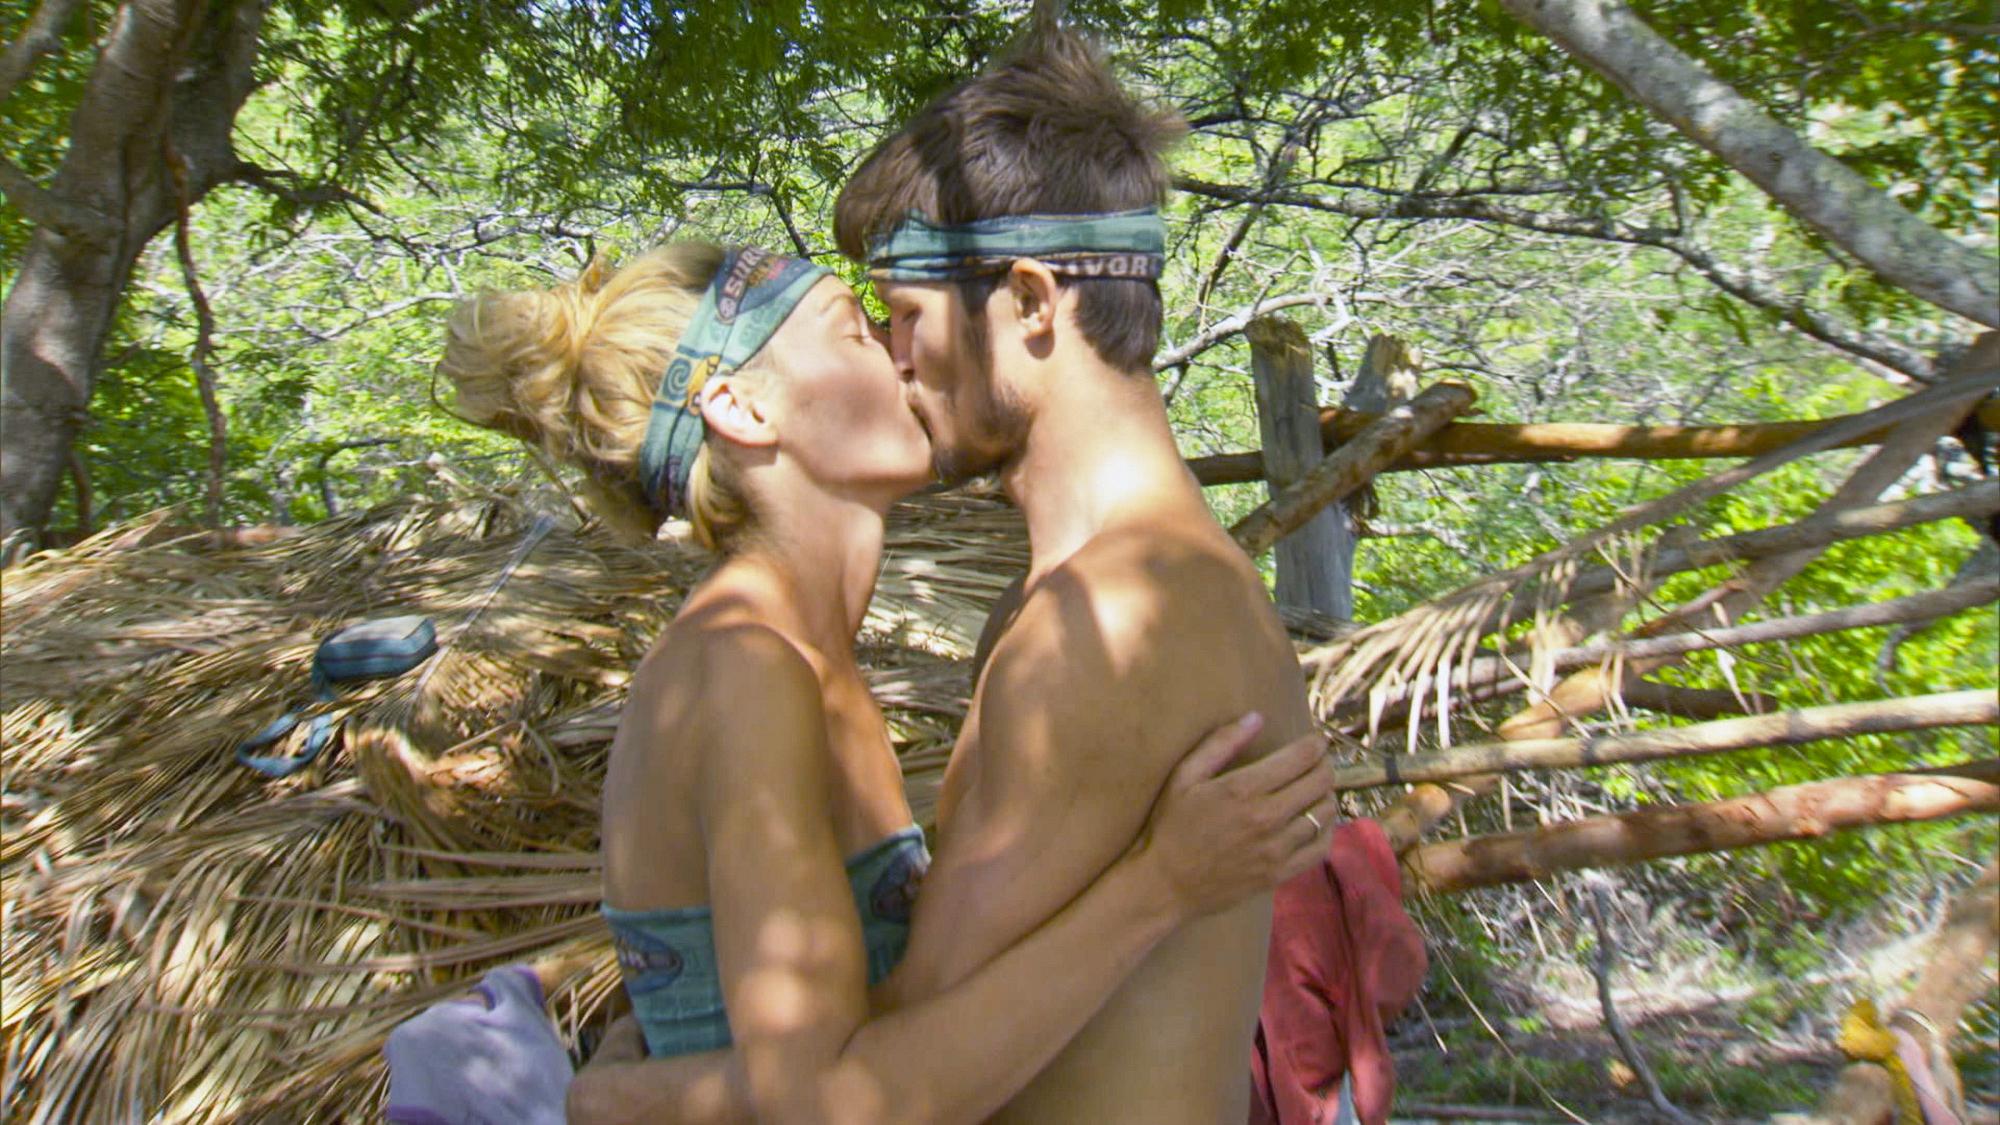 Sharing a kiss